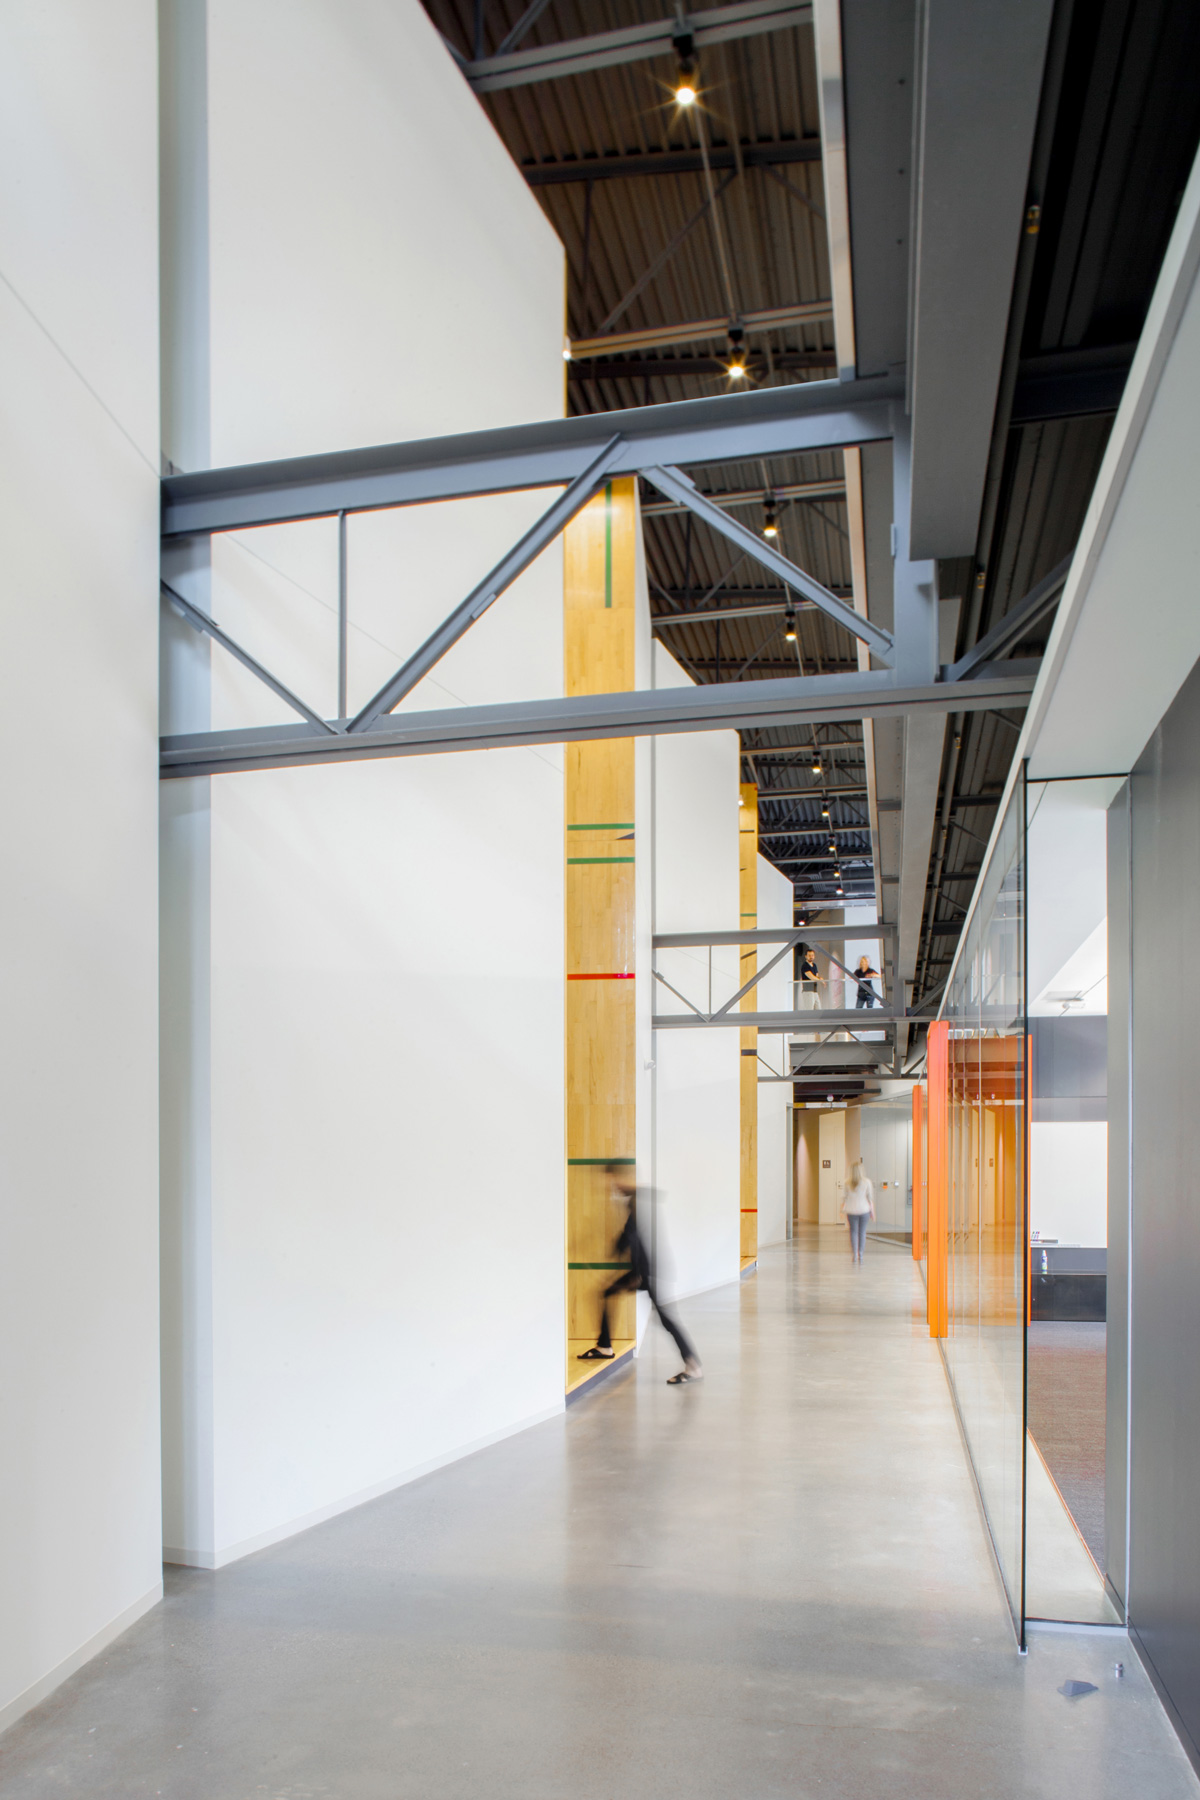 Tableau office interior hallway